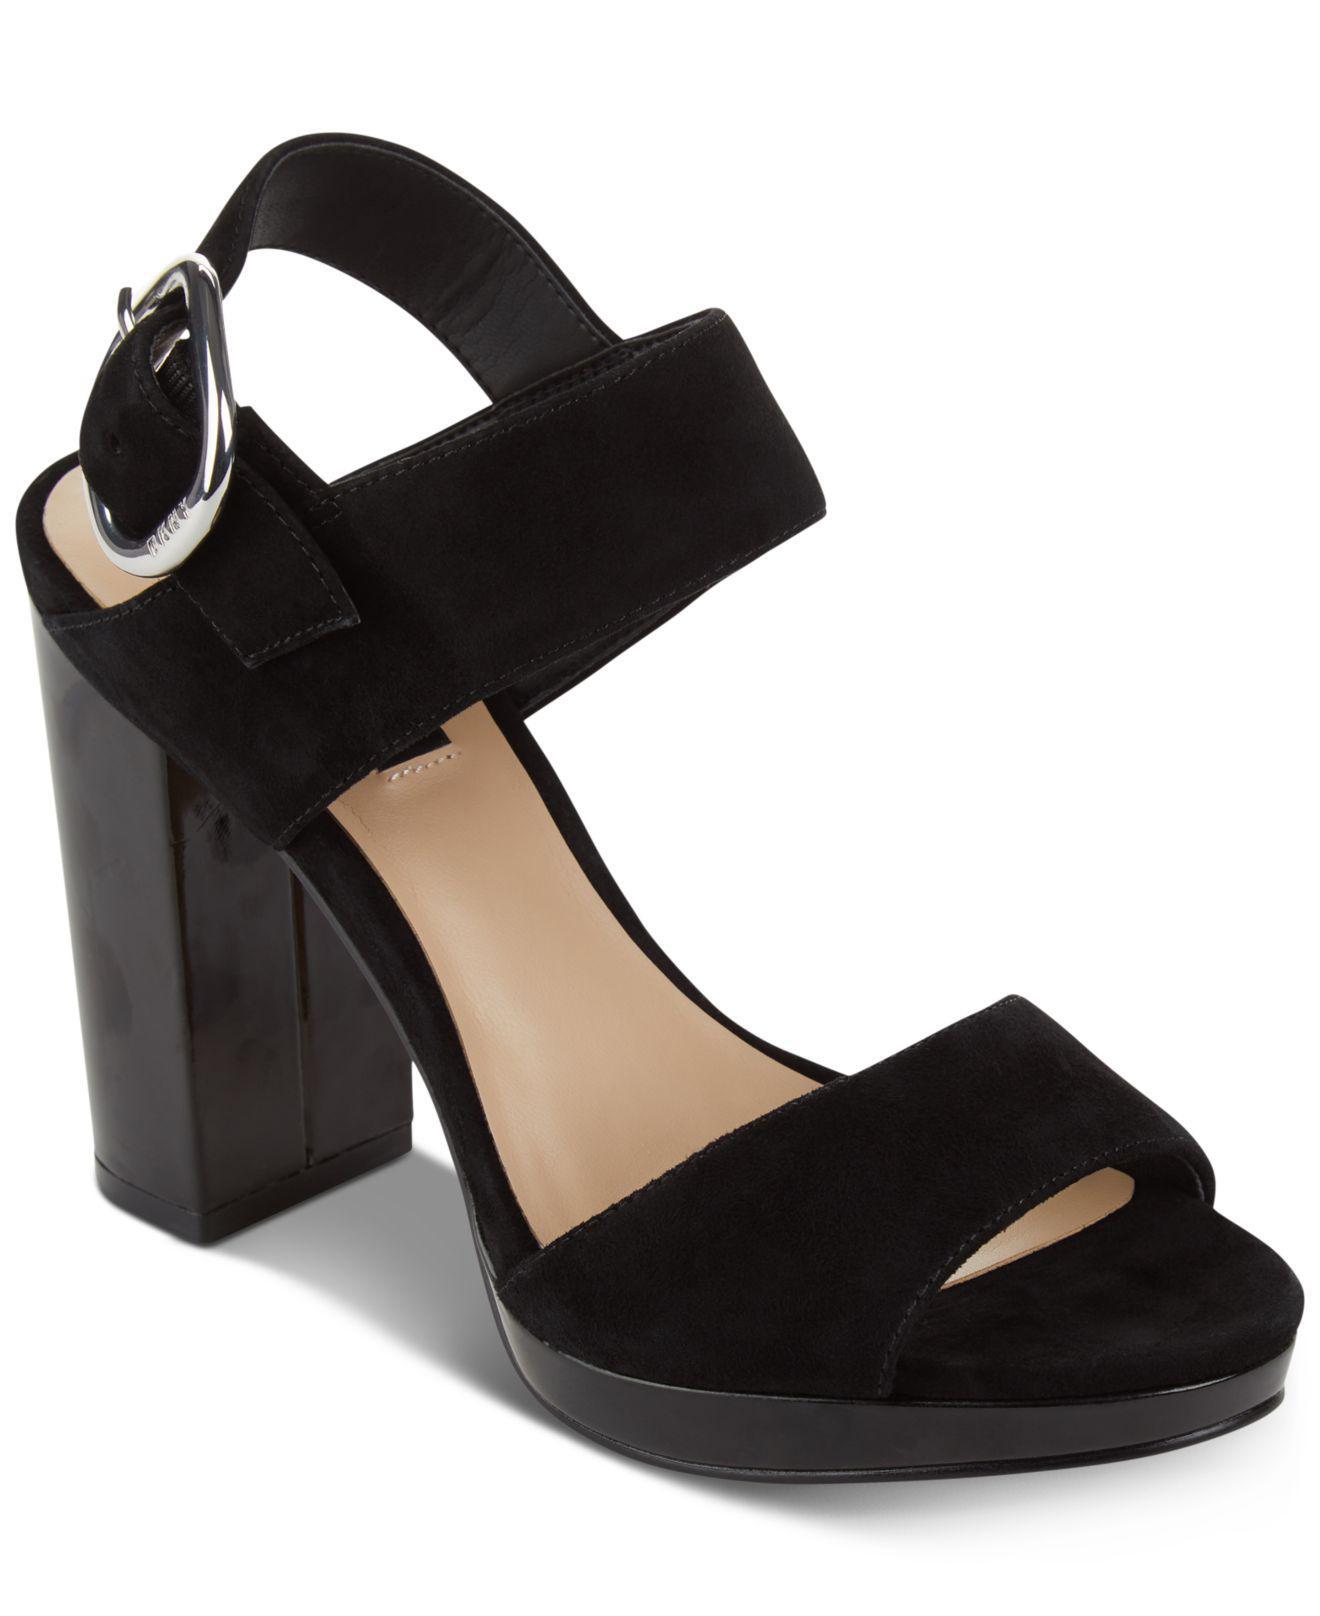 DKNY Women Bell Open Toe Casual Leather Slingback Sandals Black Size 8 US